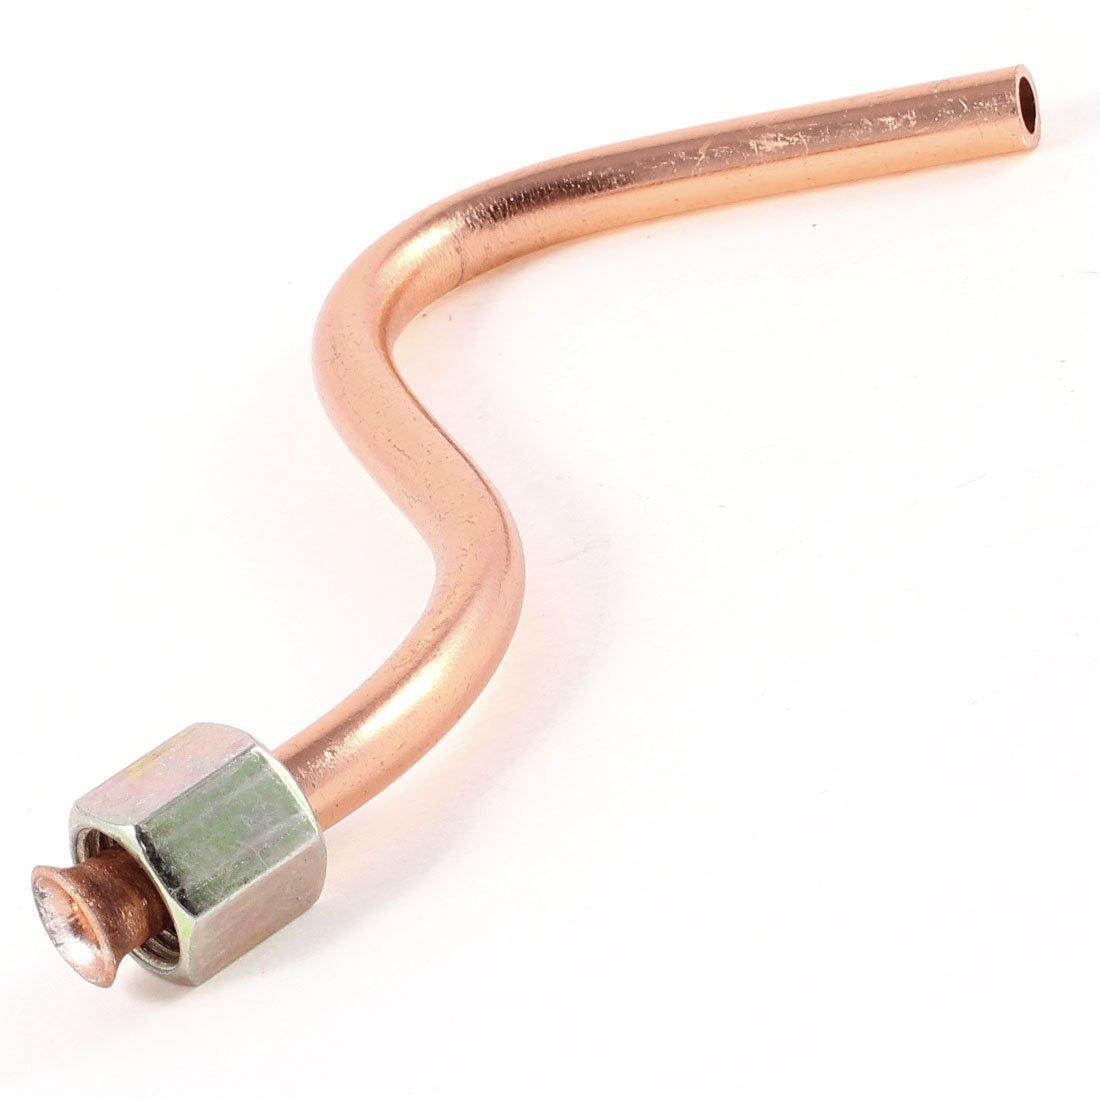 Deal MUX Air Compresor para kupferner Ton tubos de escape W 9/mm rosca Tuerca Hexagonal